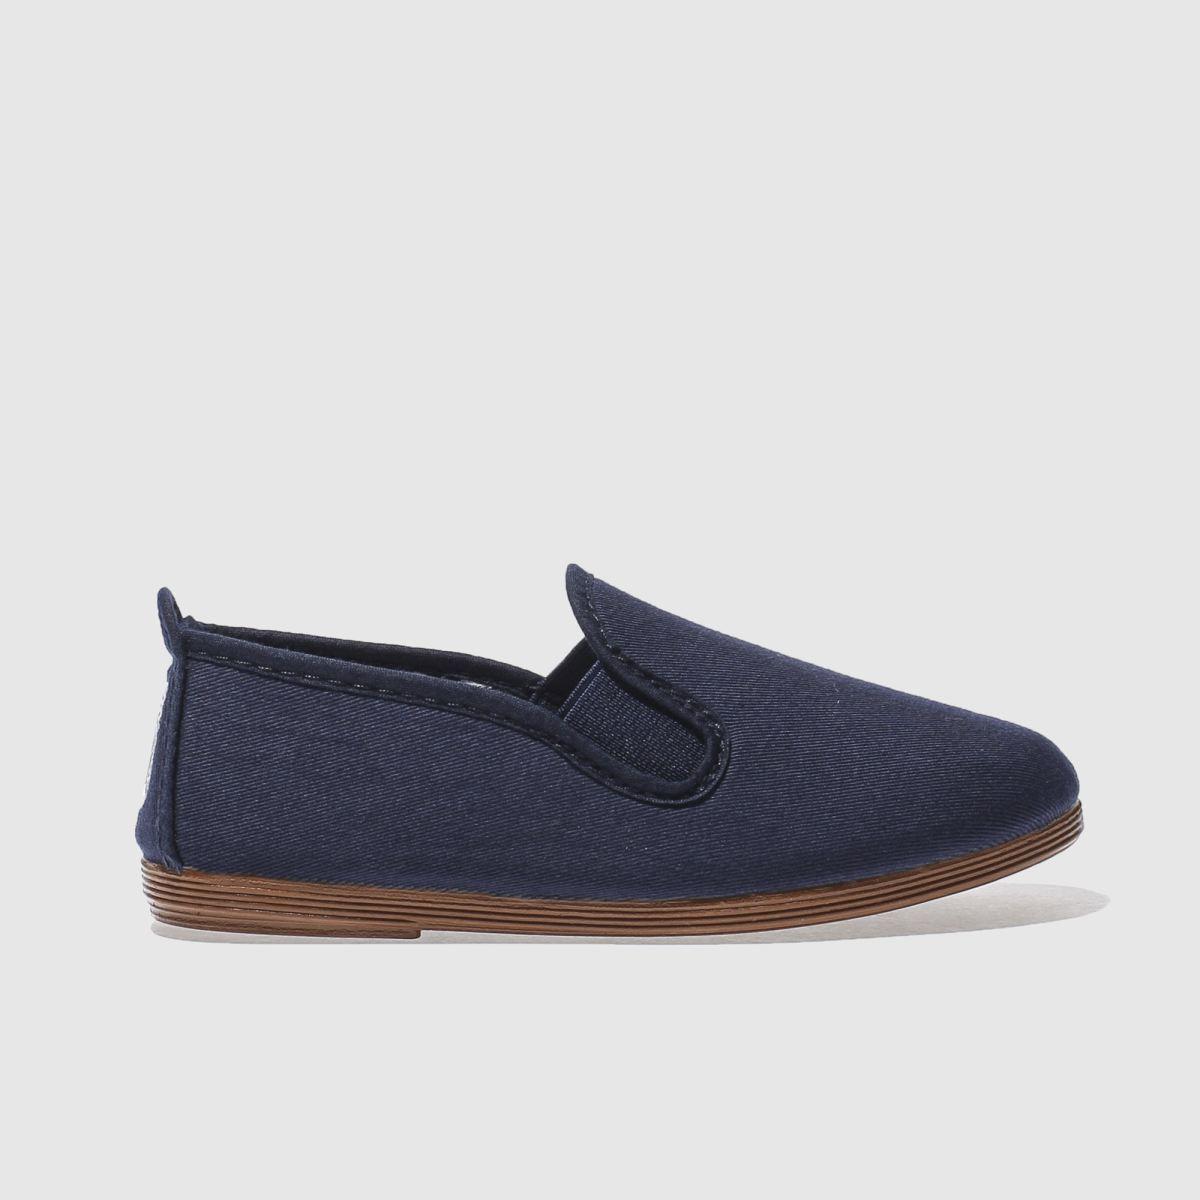 Flossy Flossy Navy Pamplona Boys Junior Shoes